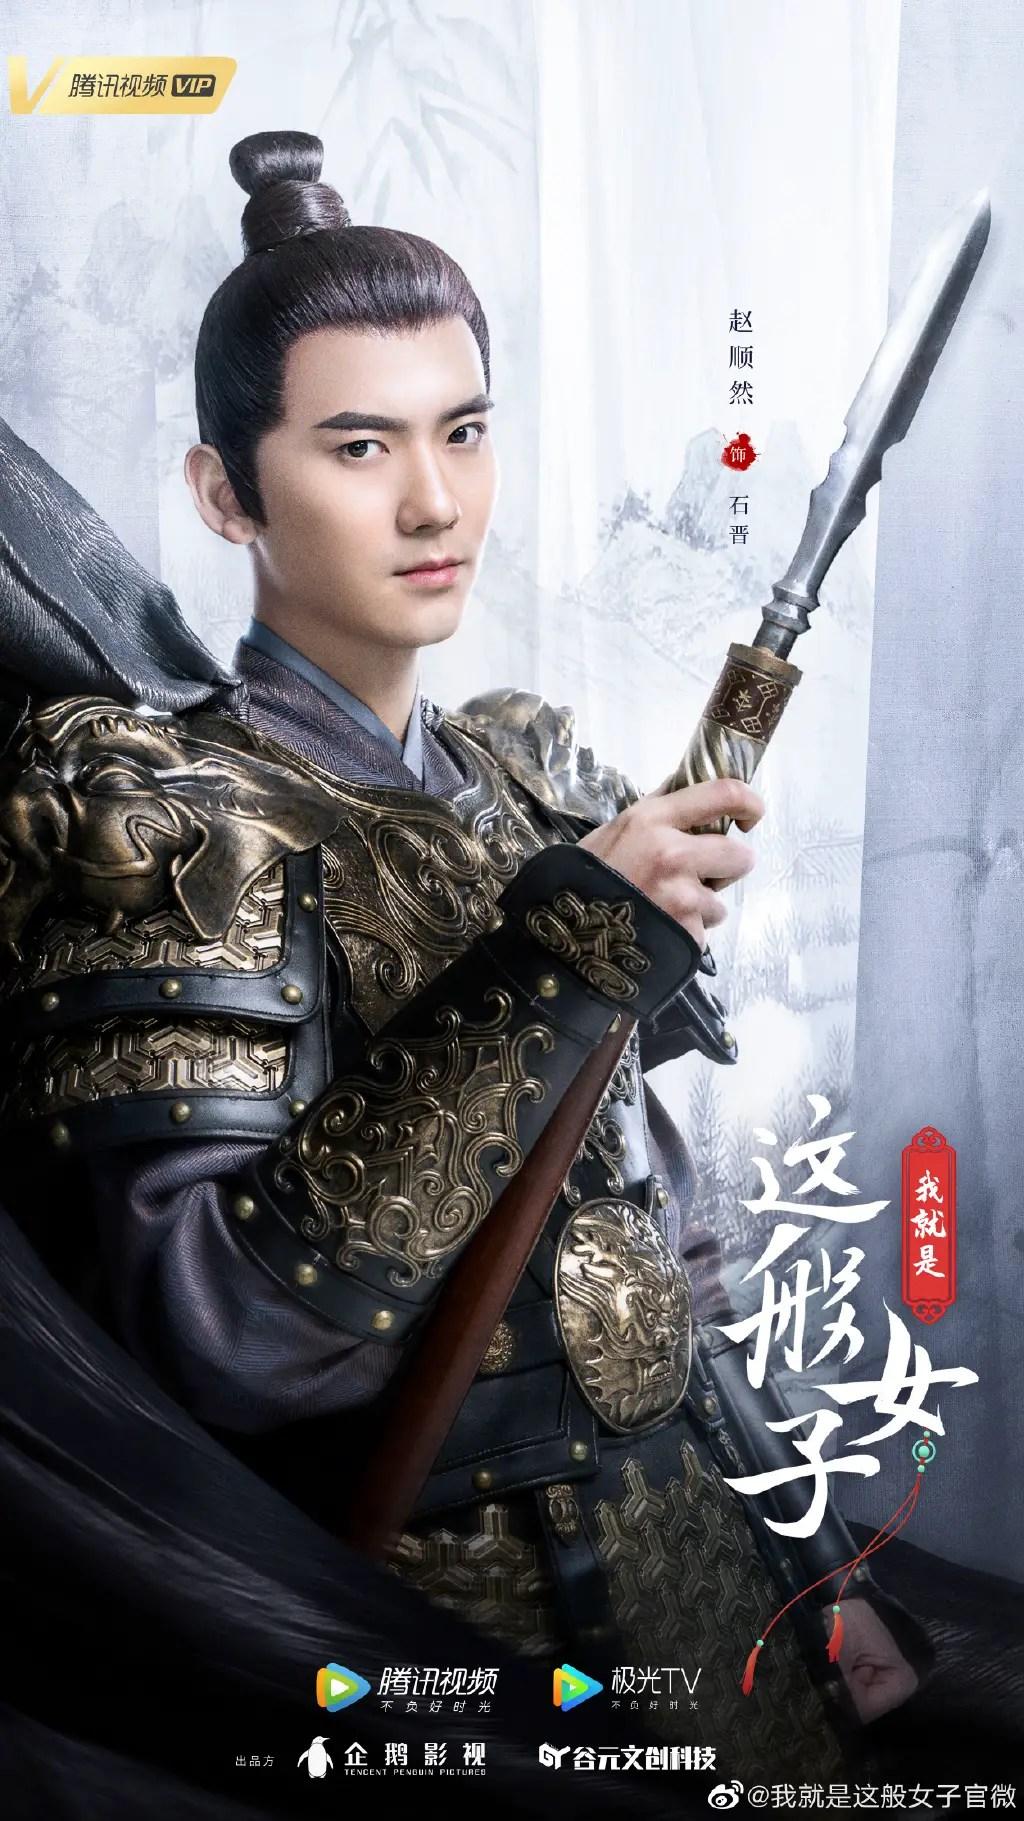 Zhao Shun Ran